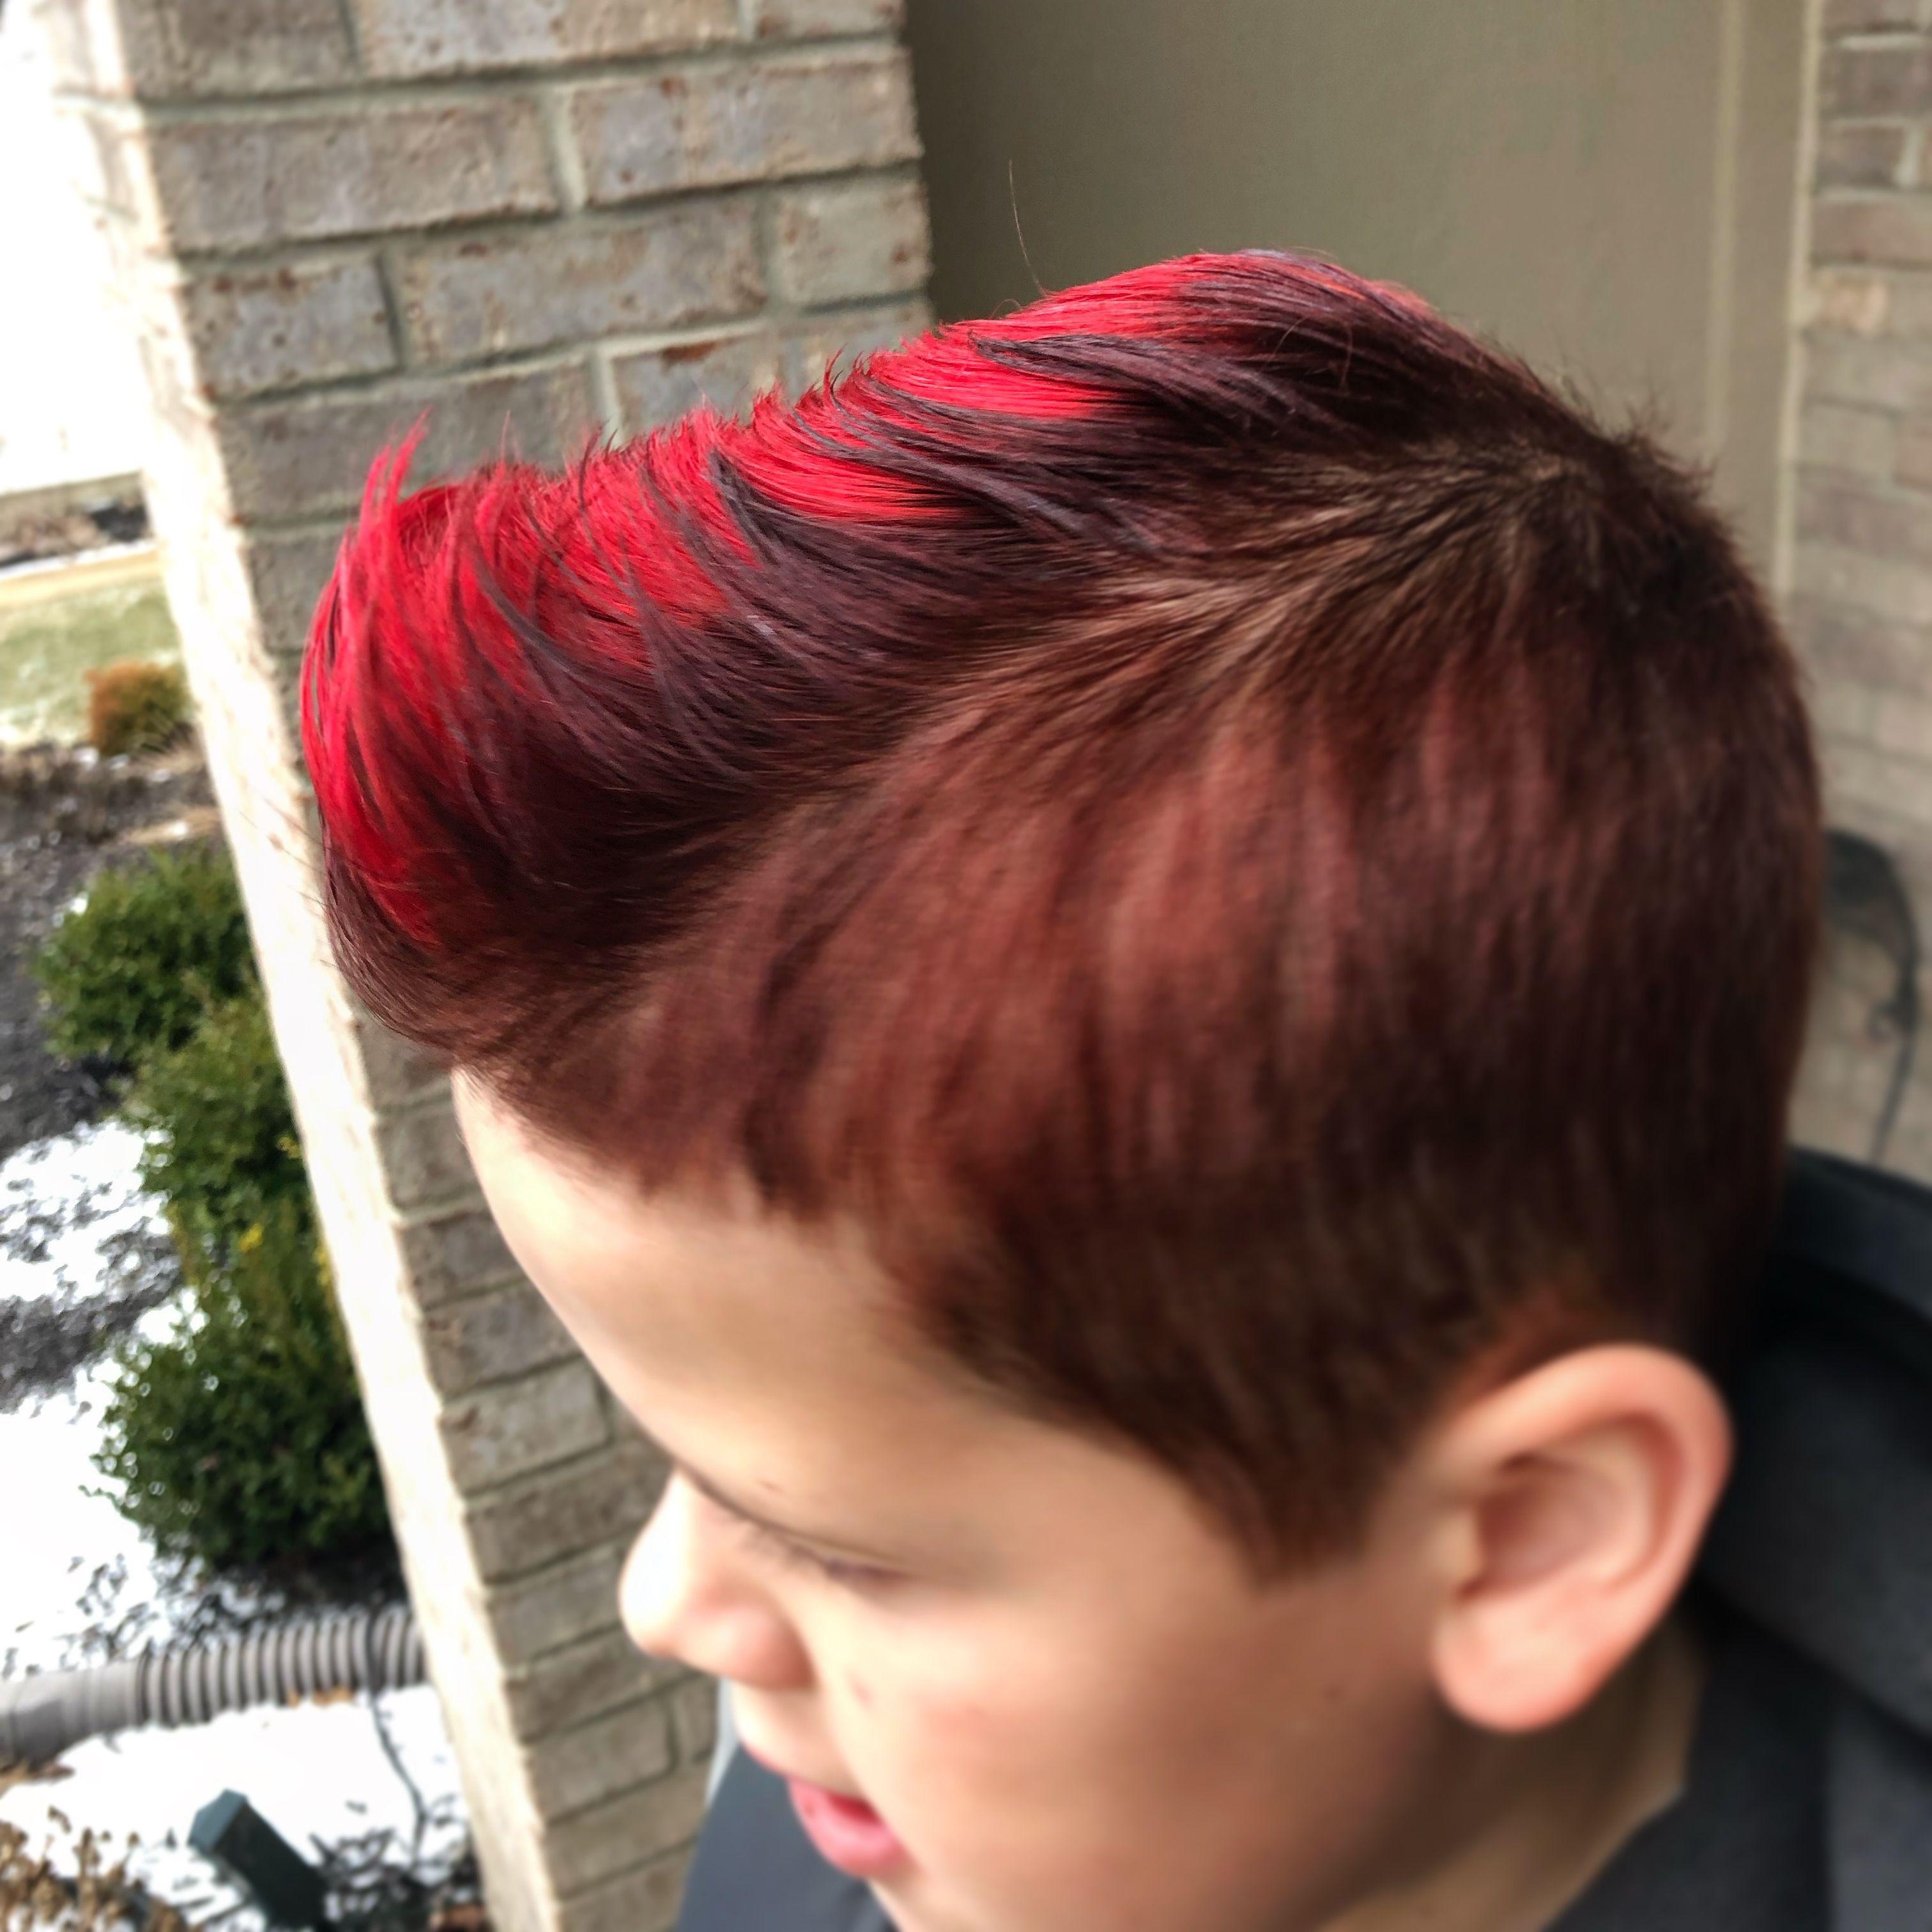 Little Boy Hair Fun Pompadour With Logics 4r And Pravana Vivid Red On The Top Little Boy Hairstyles Kids Hairstyles Boy Hairstyles